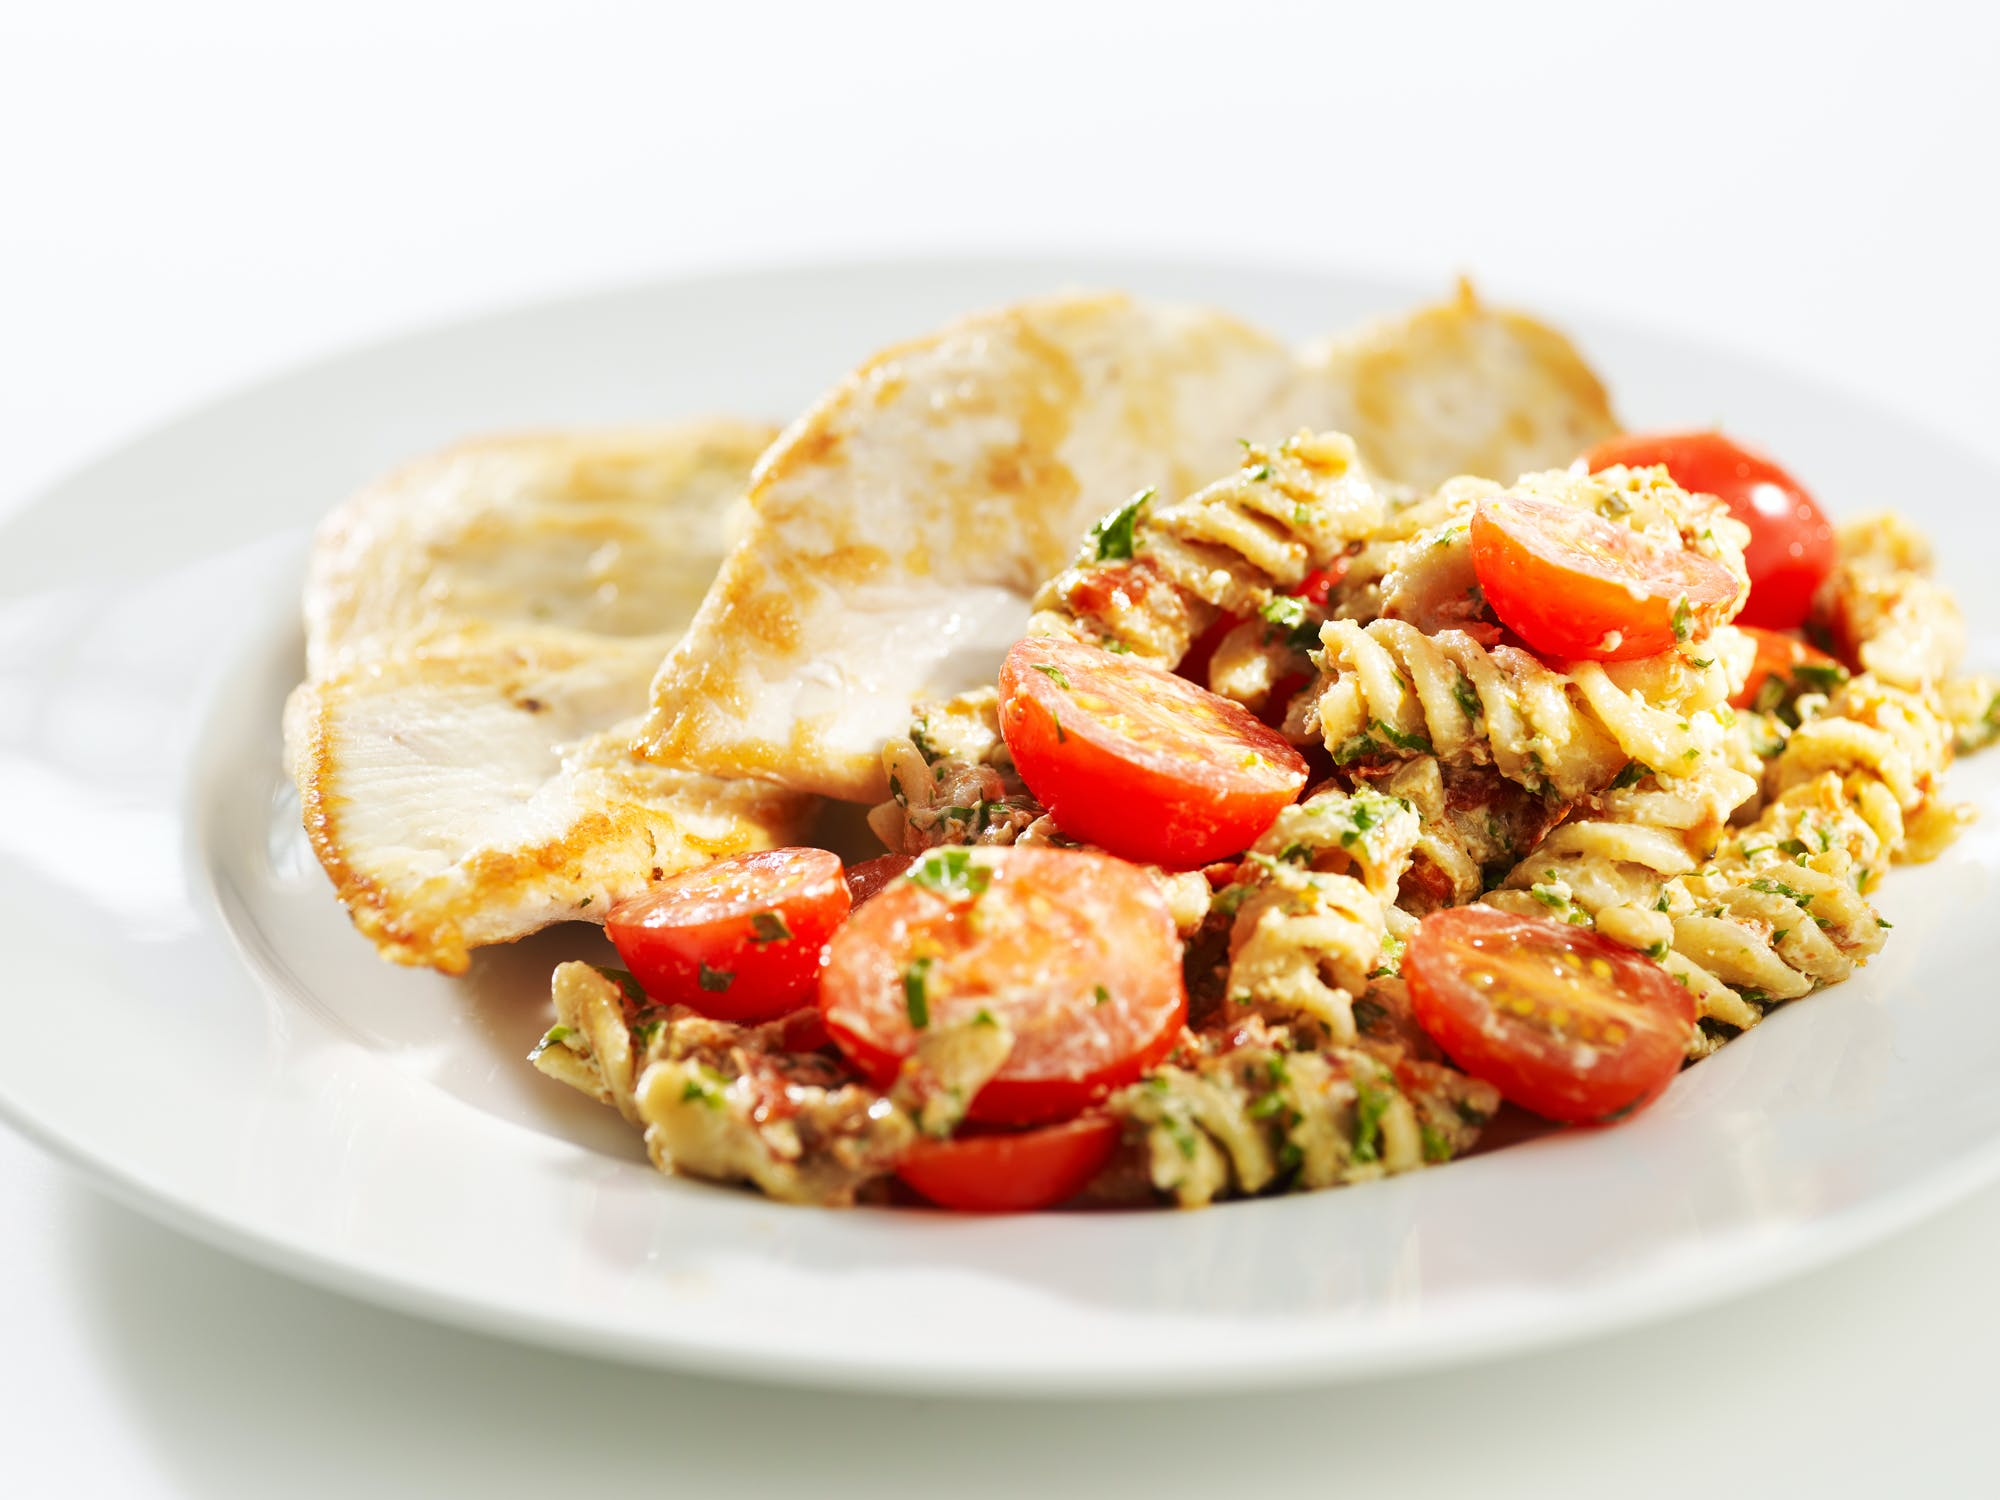 sunn mat oppskrifter salat mettende salat kylling med purre og parer oppskrift